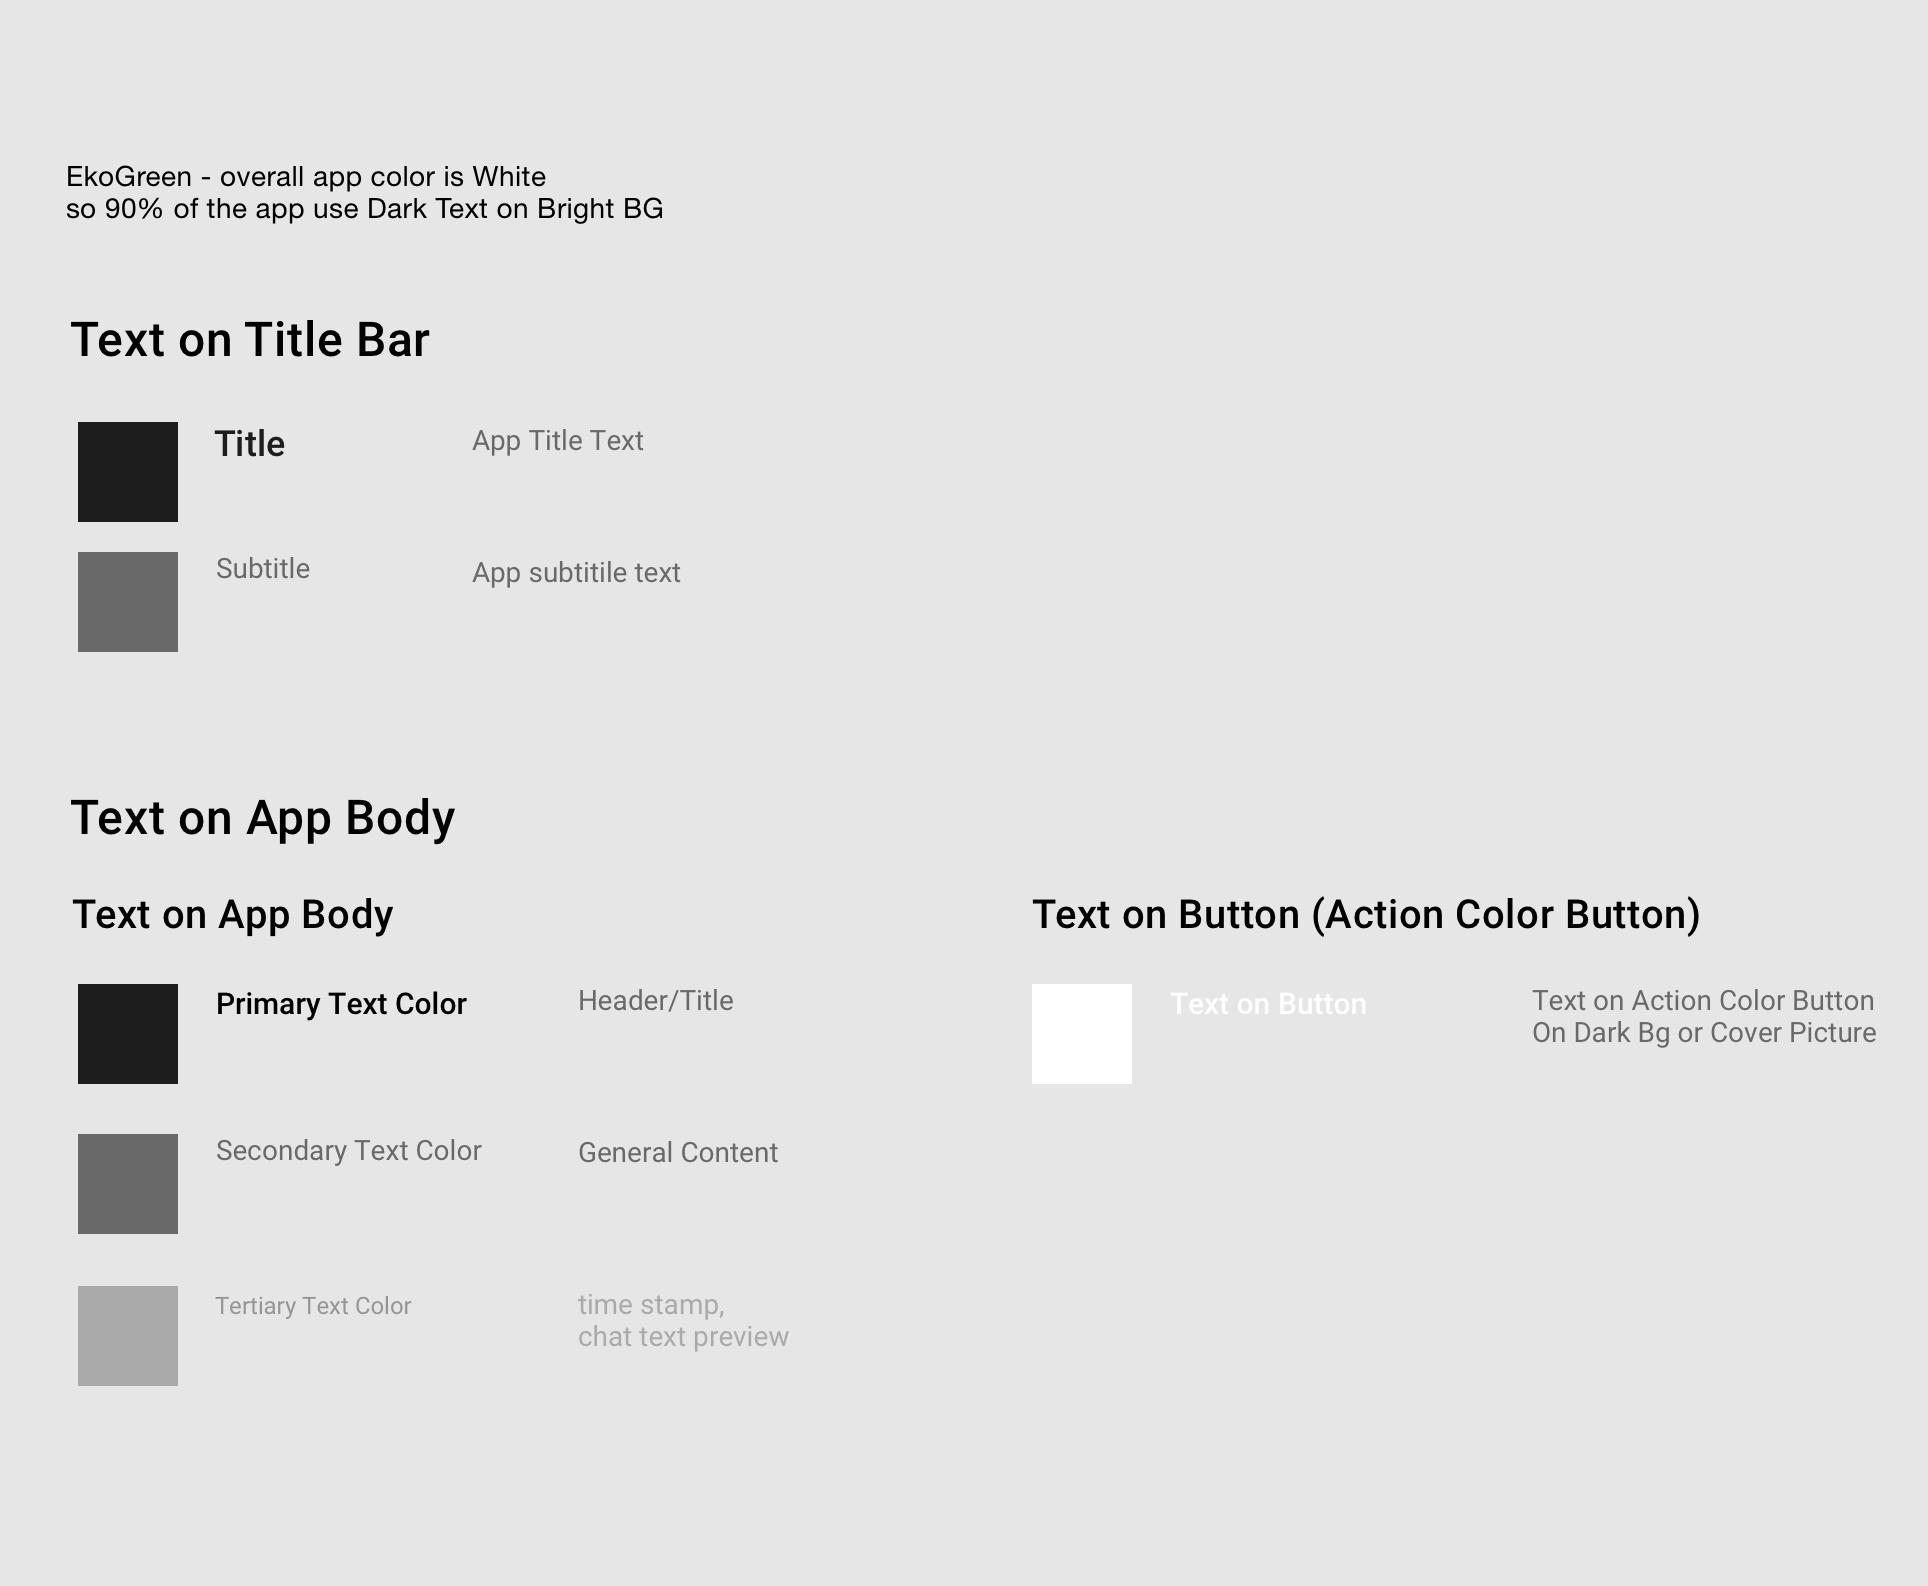 EkoGreen - StyleGuide - Overall Font Guide